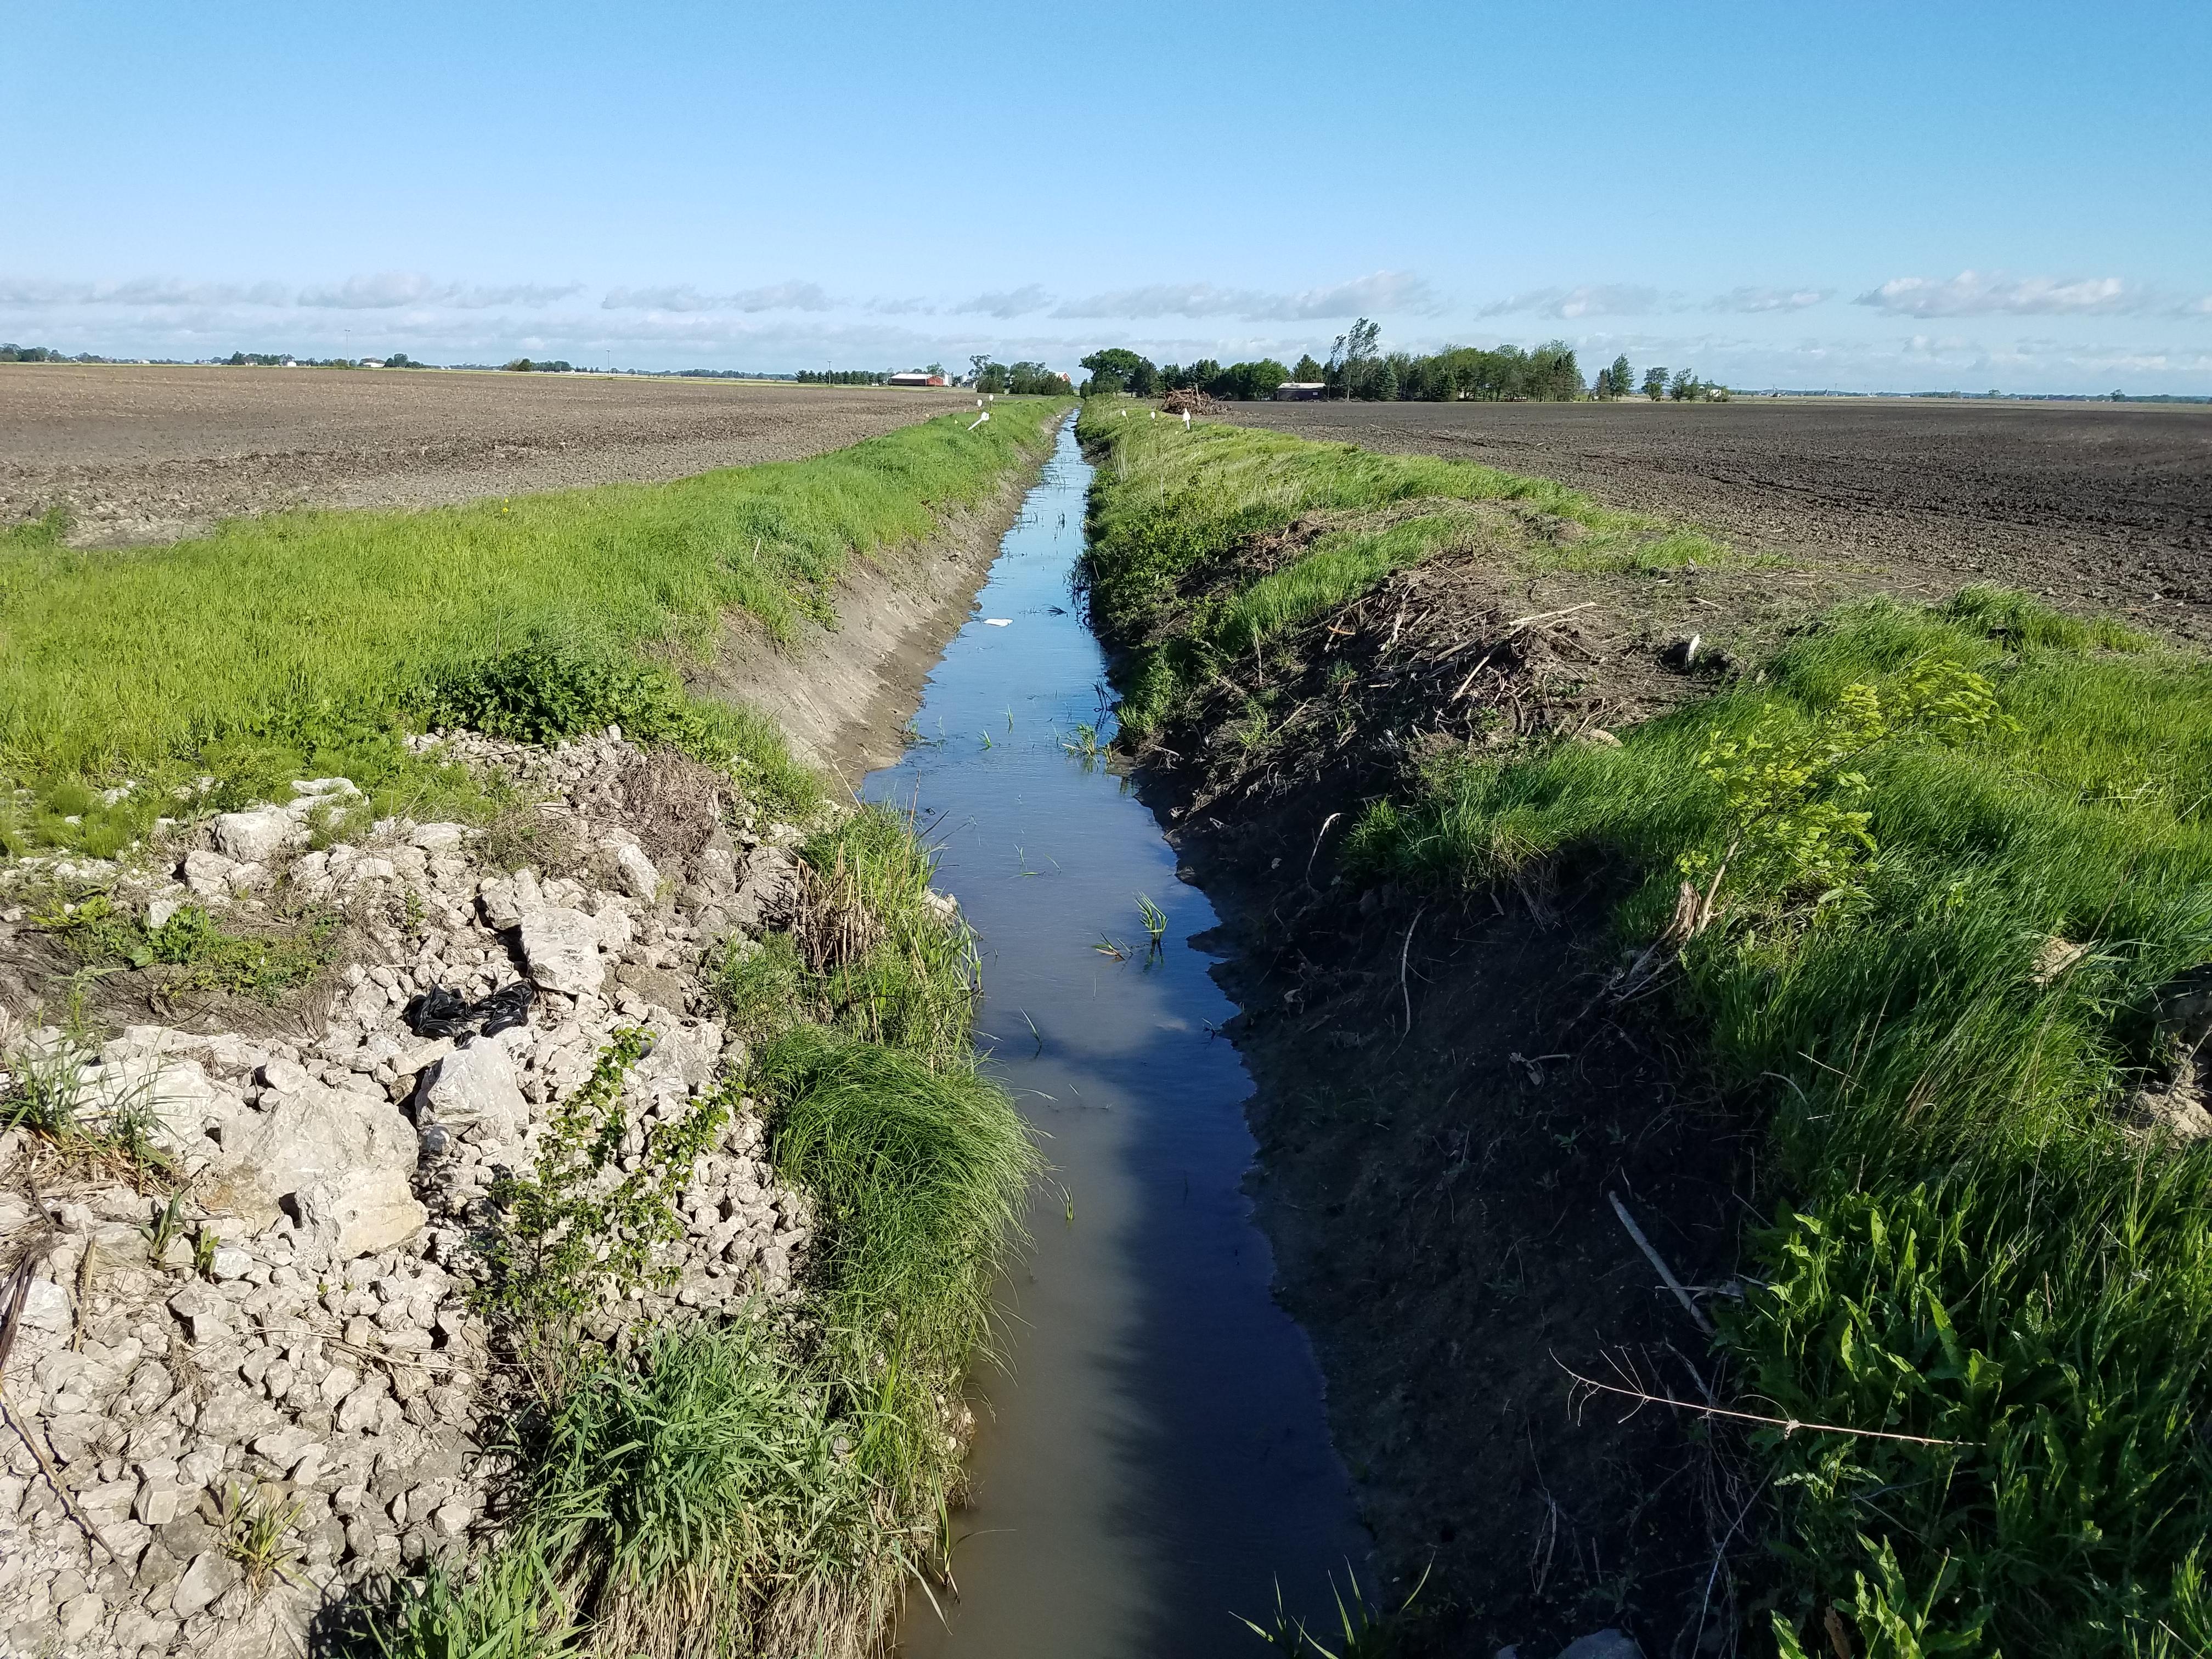 Phebus McCoy Farm of Drainage Ditch